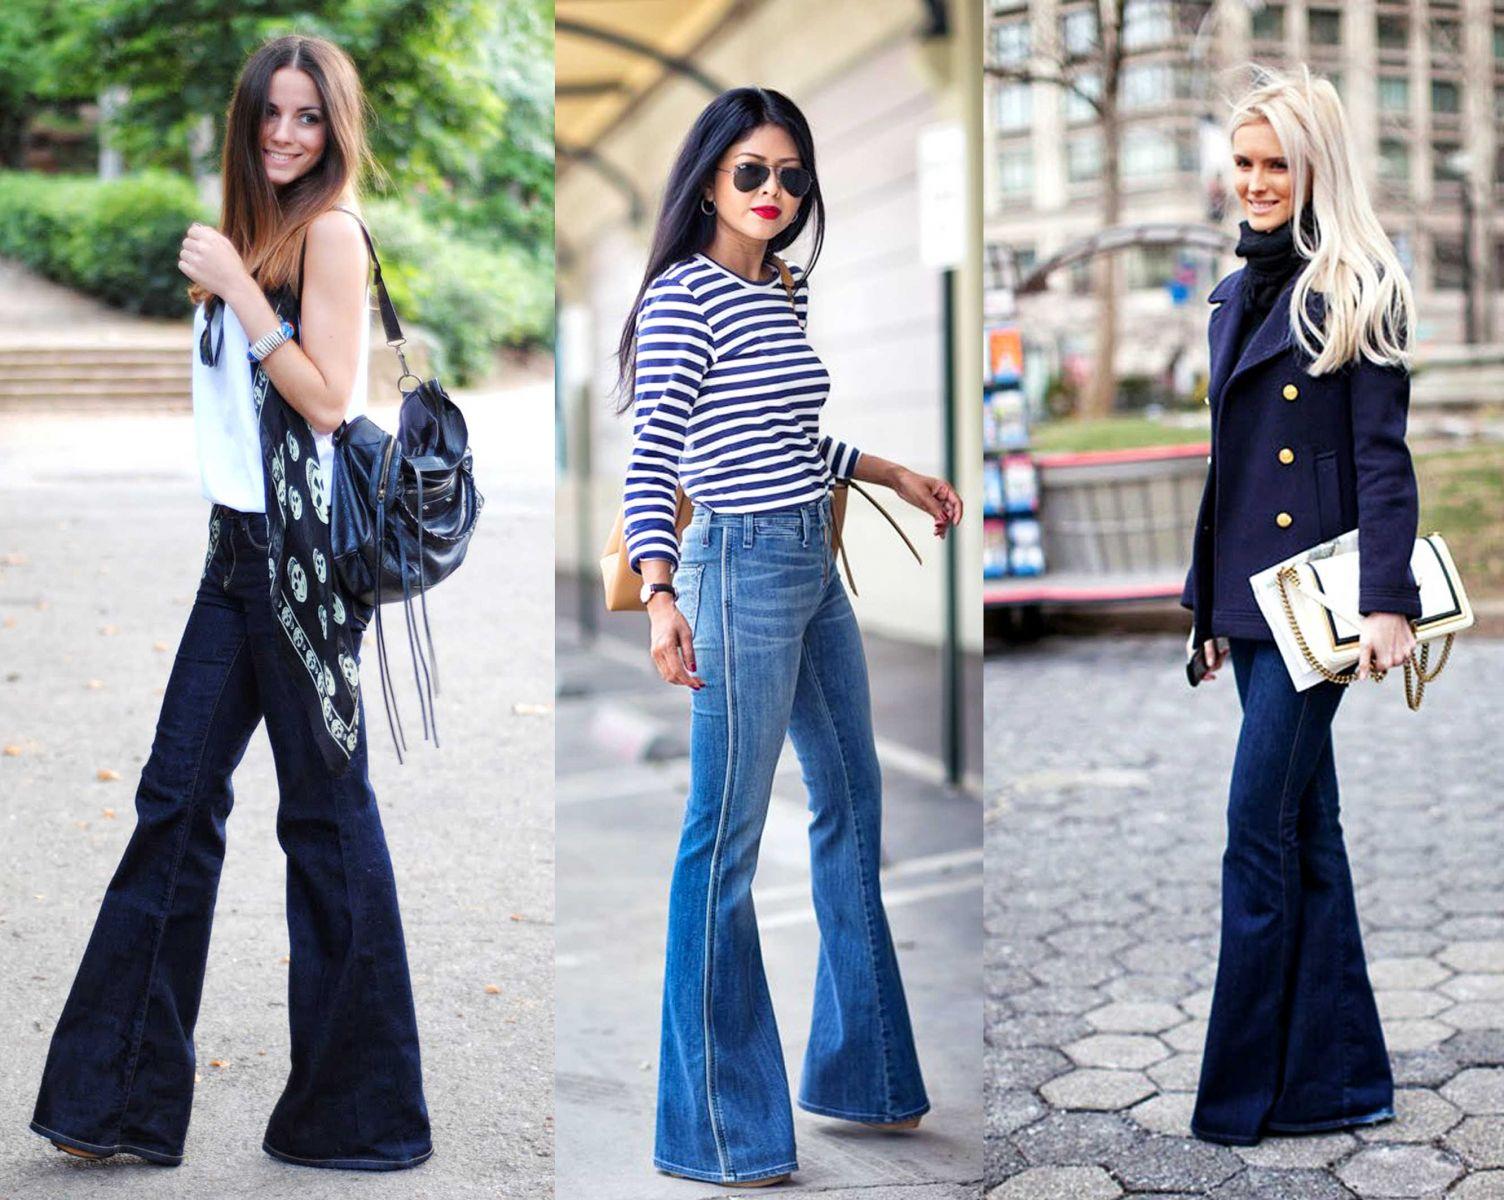 Мода 70-х: джинсы - клеш   Мода   Блоги   i-gency.ru